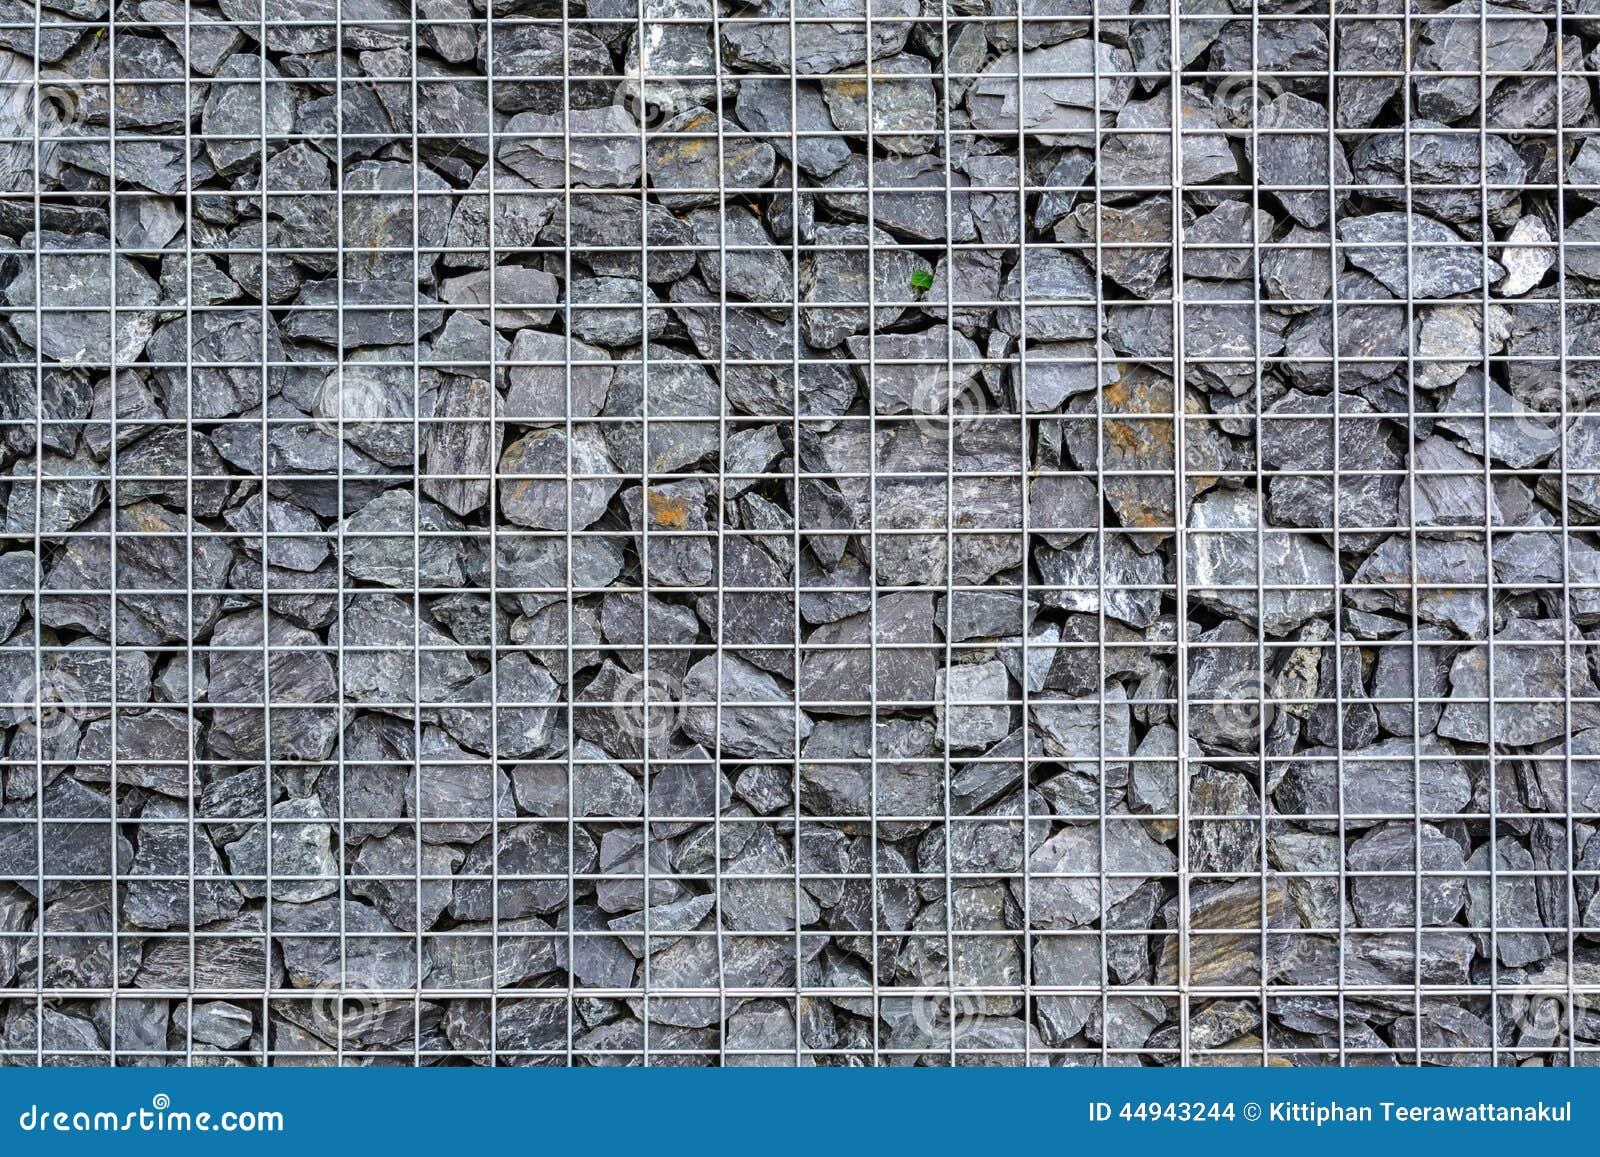 grillage rempli de pierres photo stock image 44943244. Black Bedroom Furniture Sets. Home Design Ideas